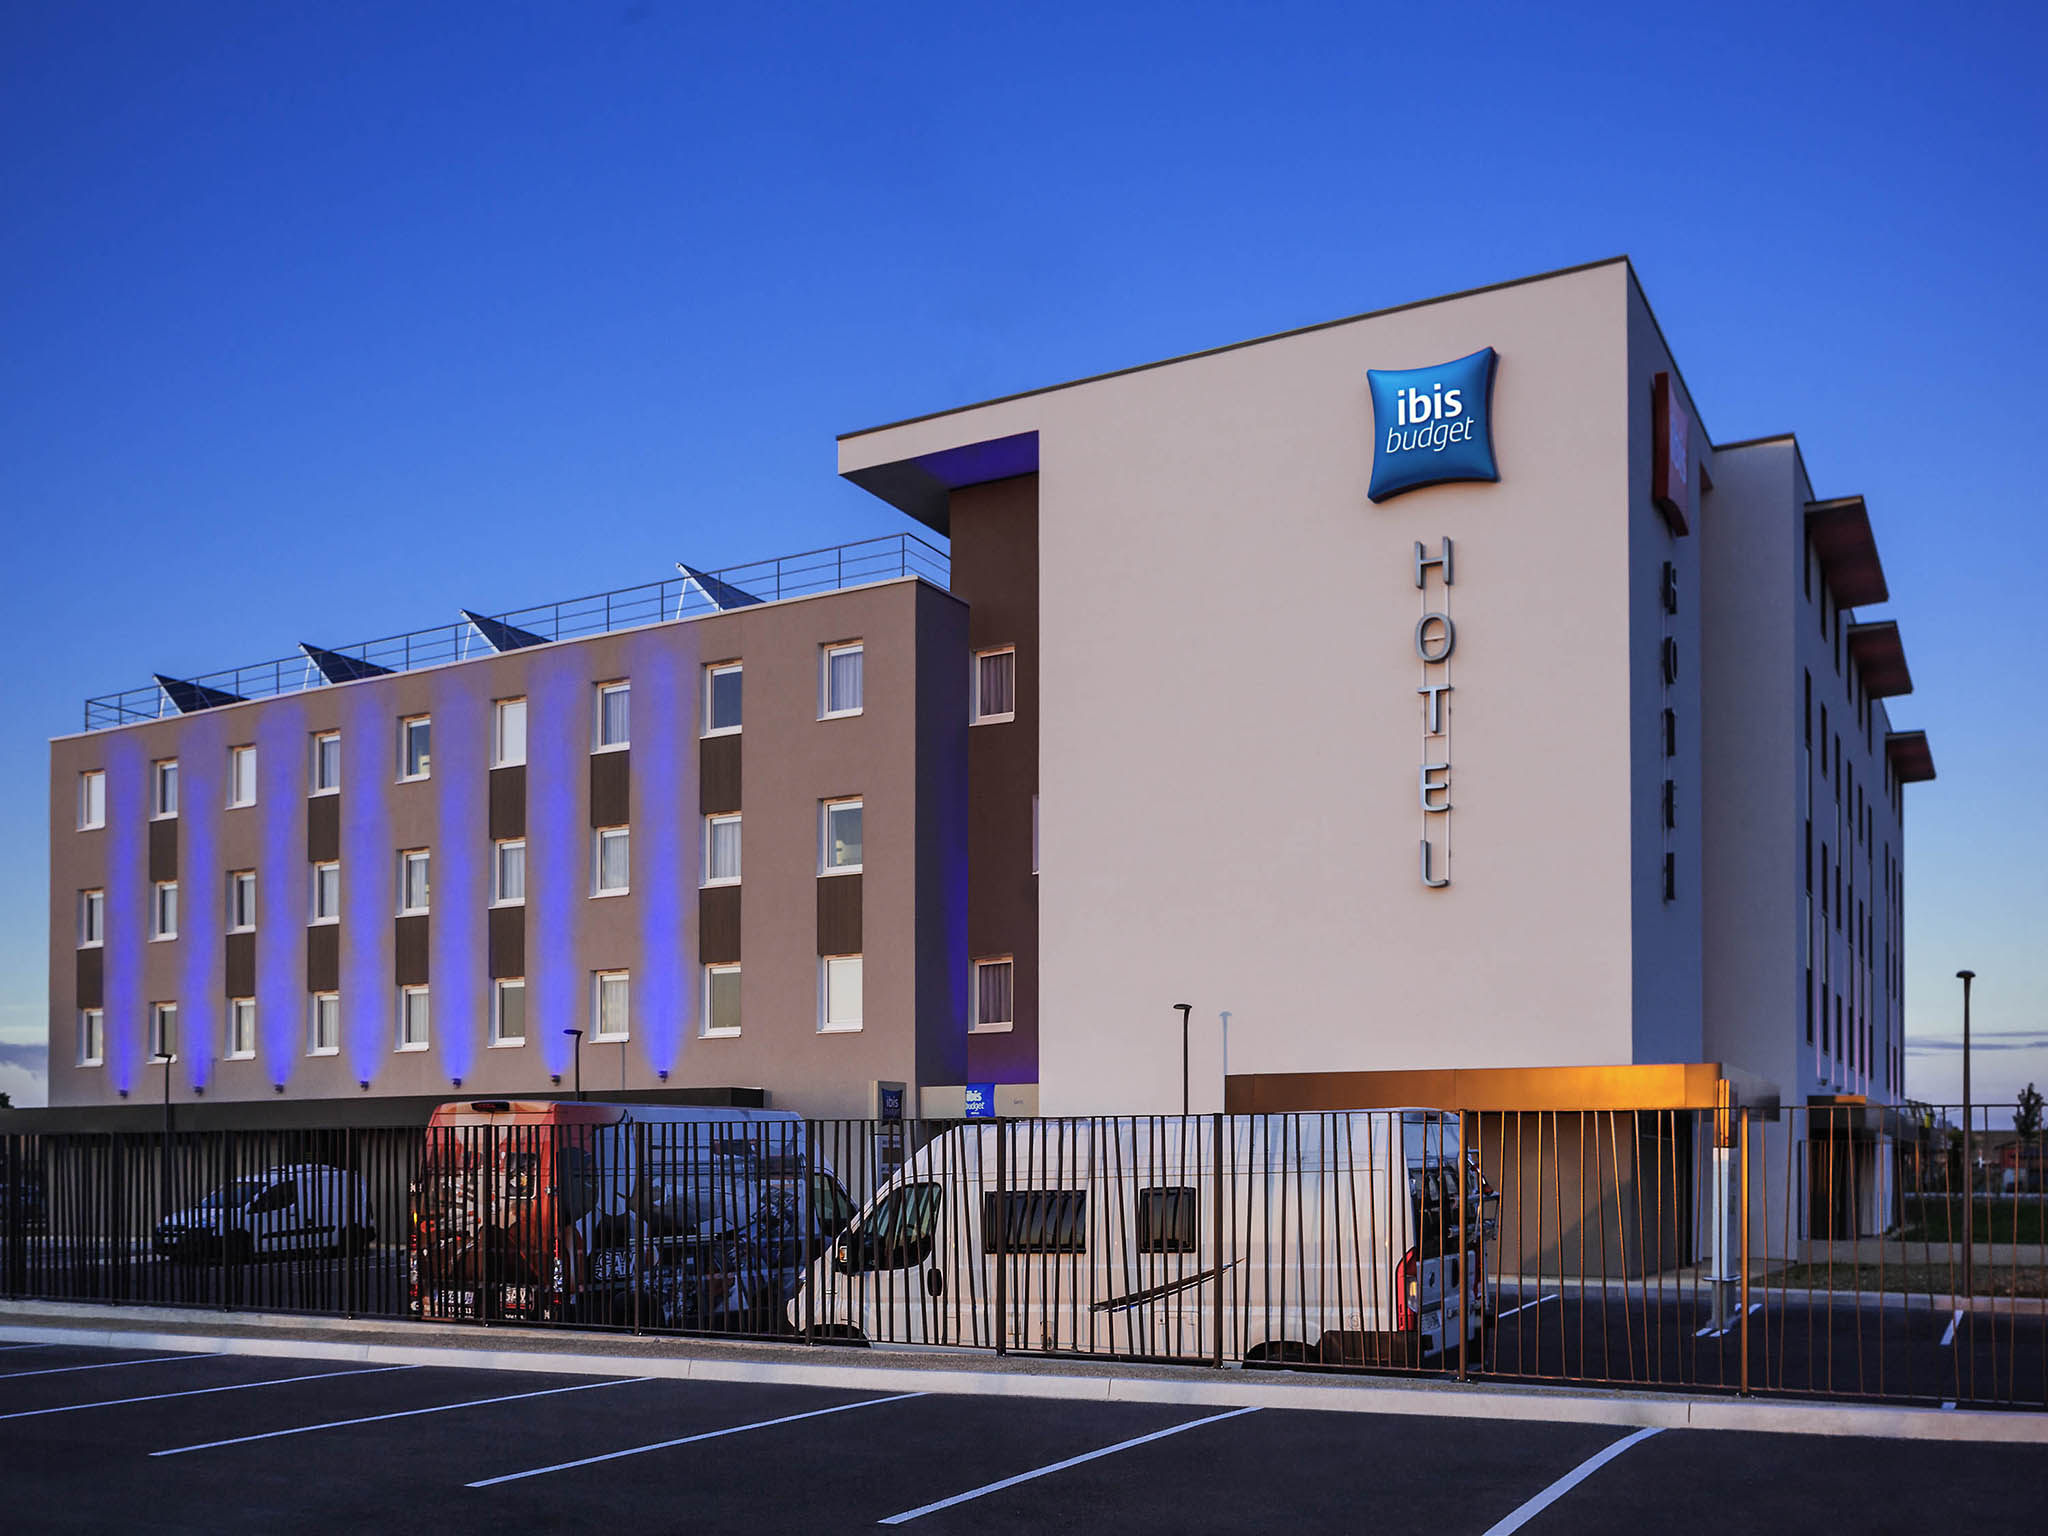 Hotel - ibis budget Sens